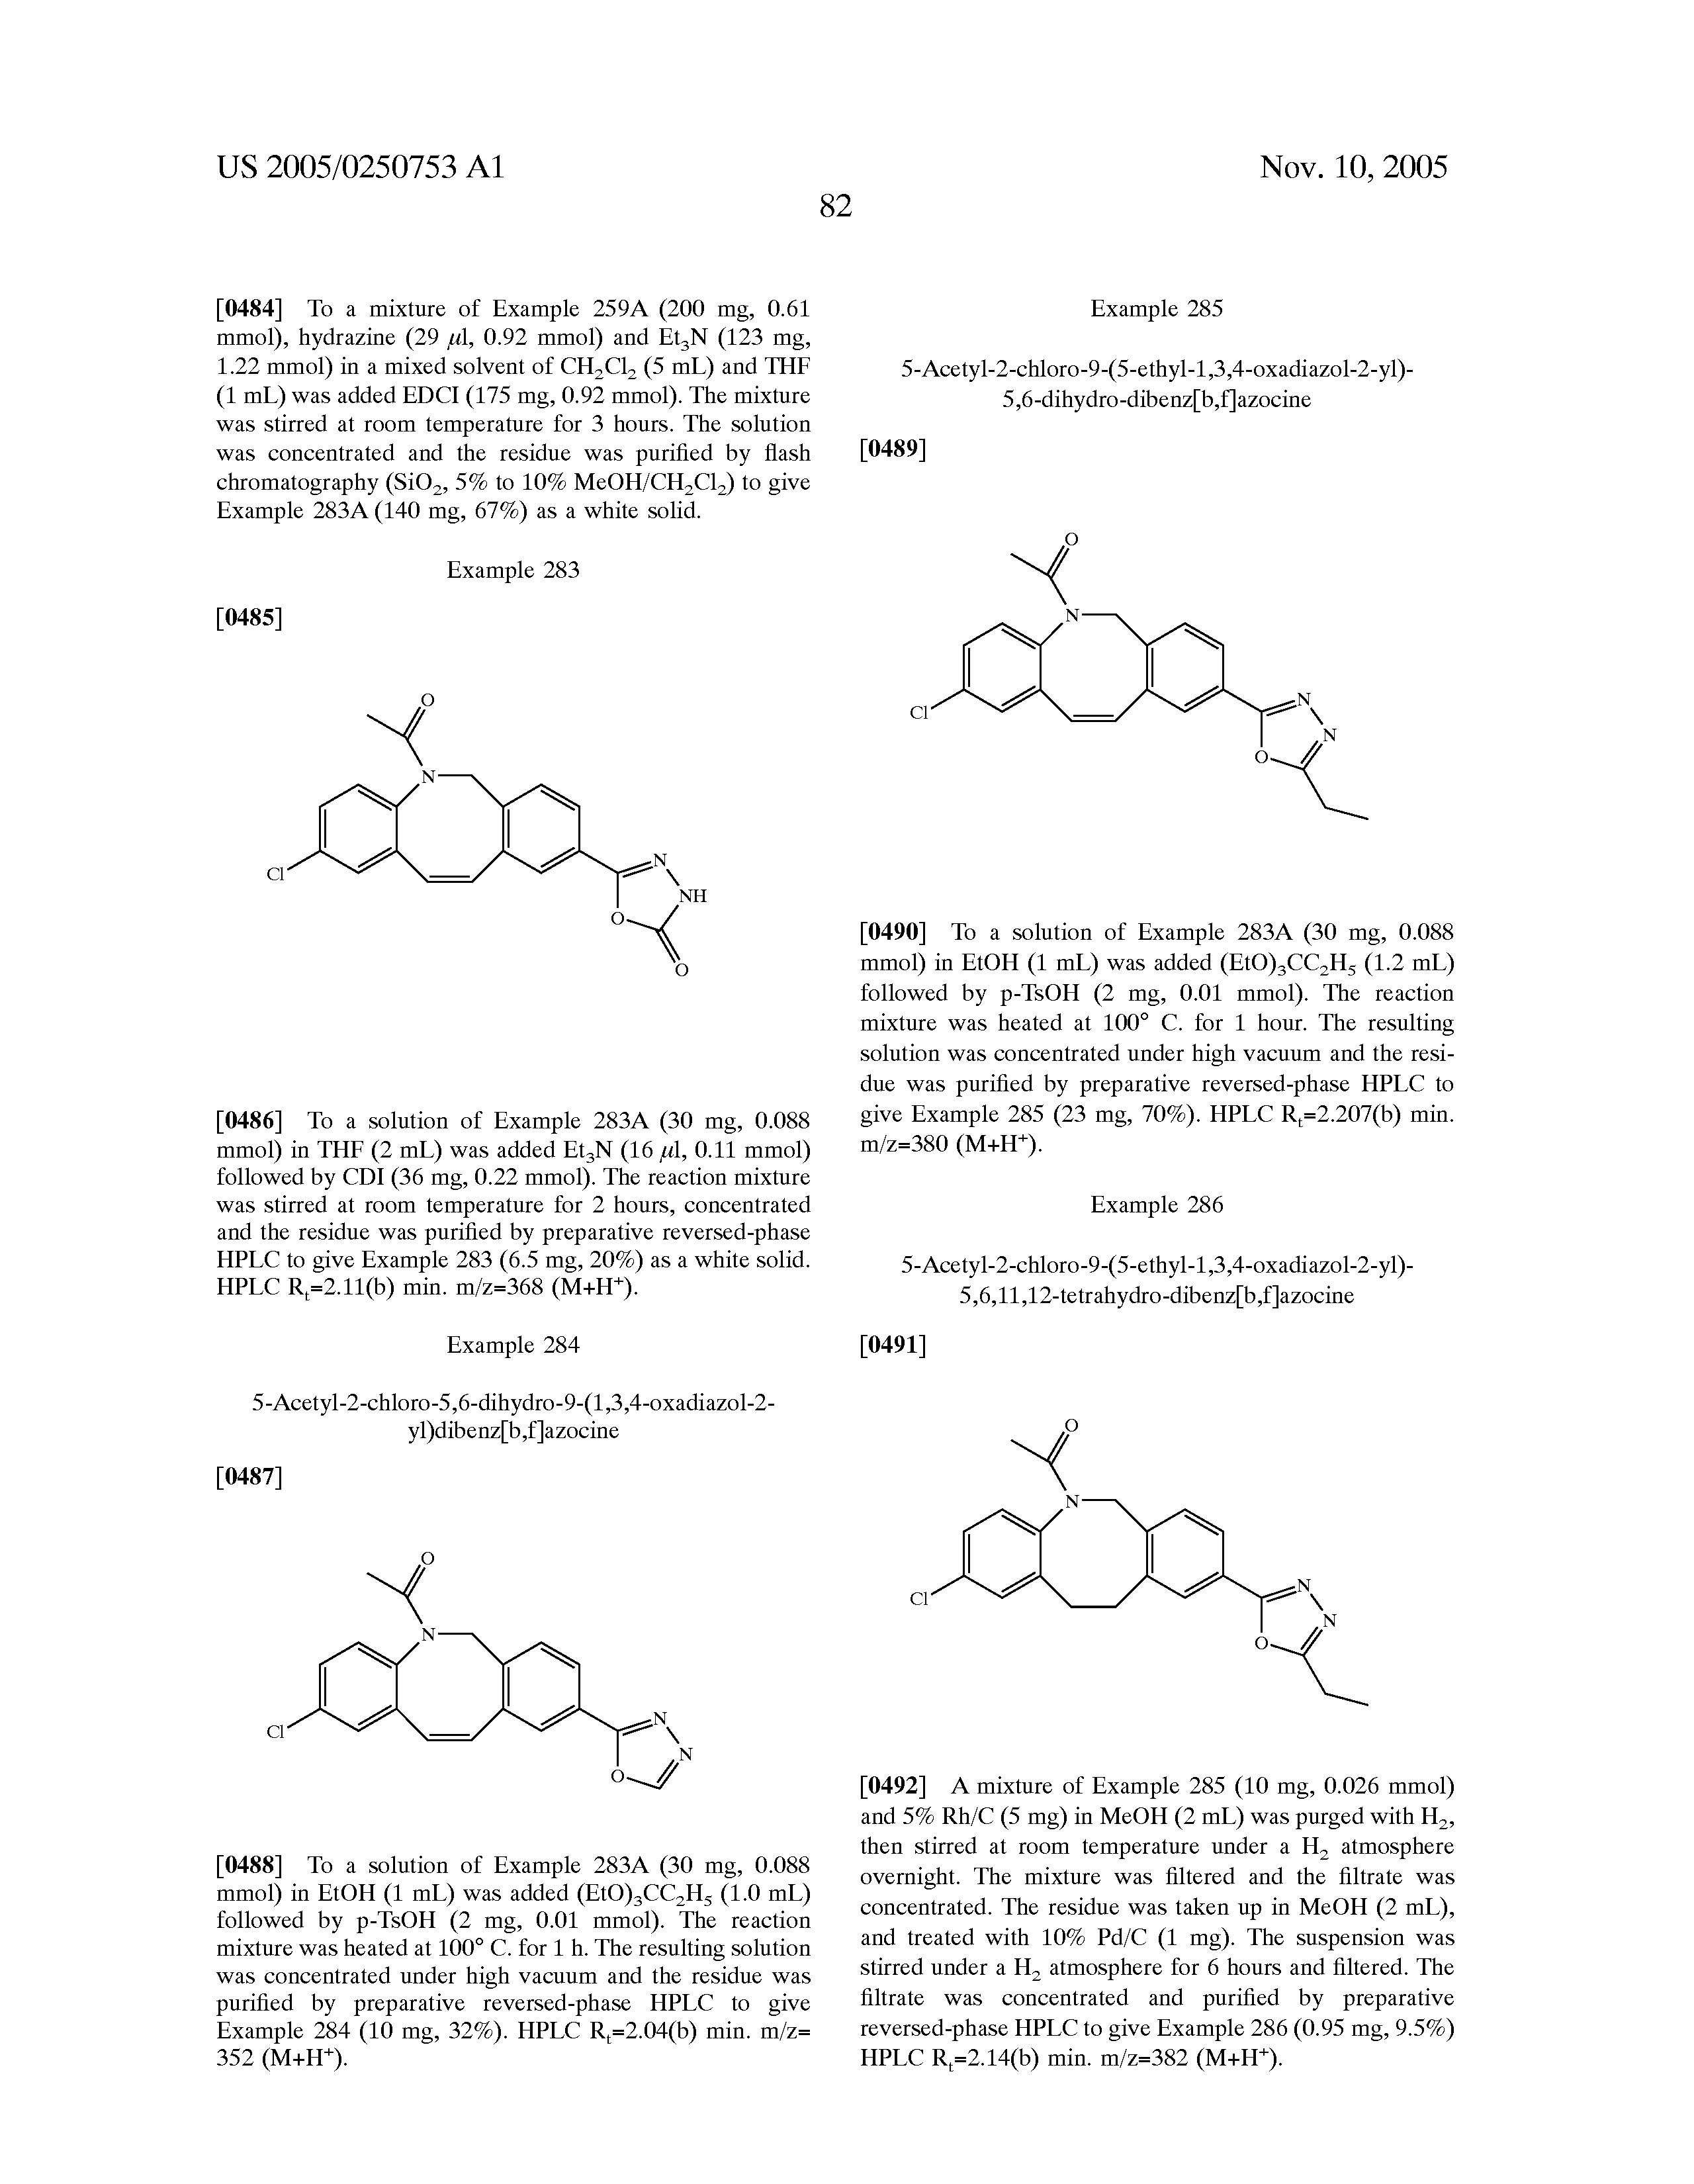 17beta hydroxysteroid dehydrogenase 3 deficiency